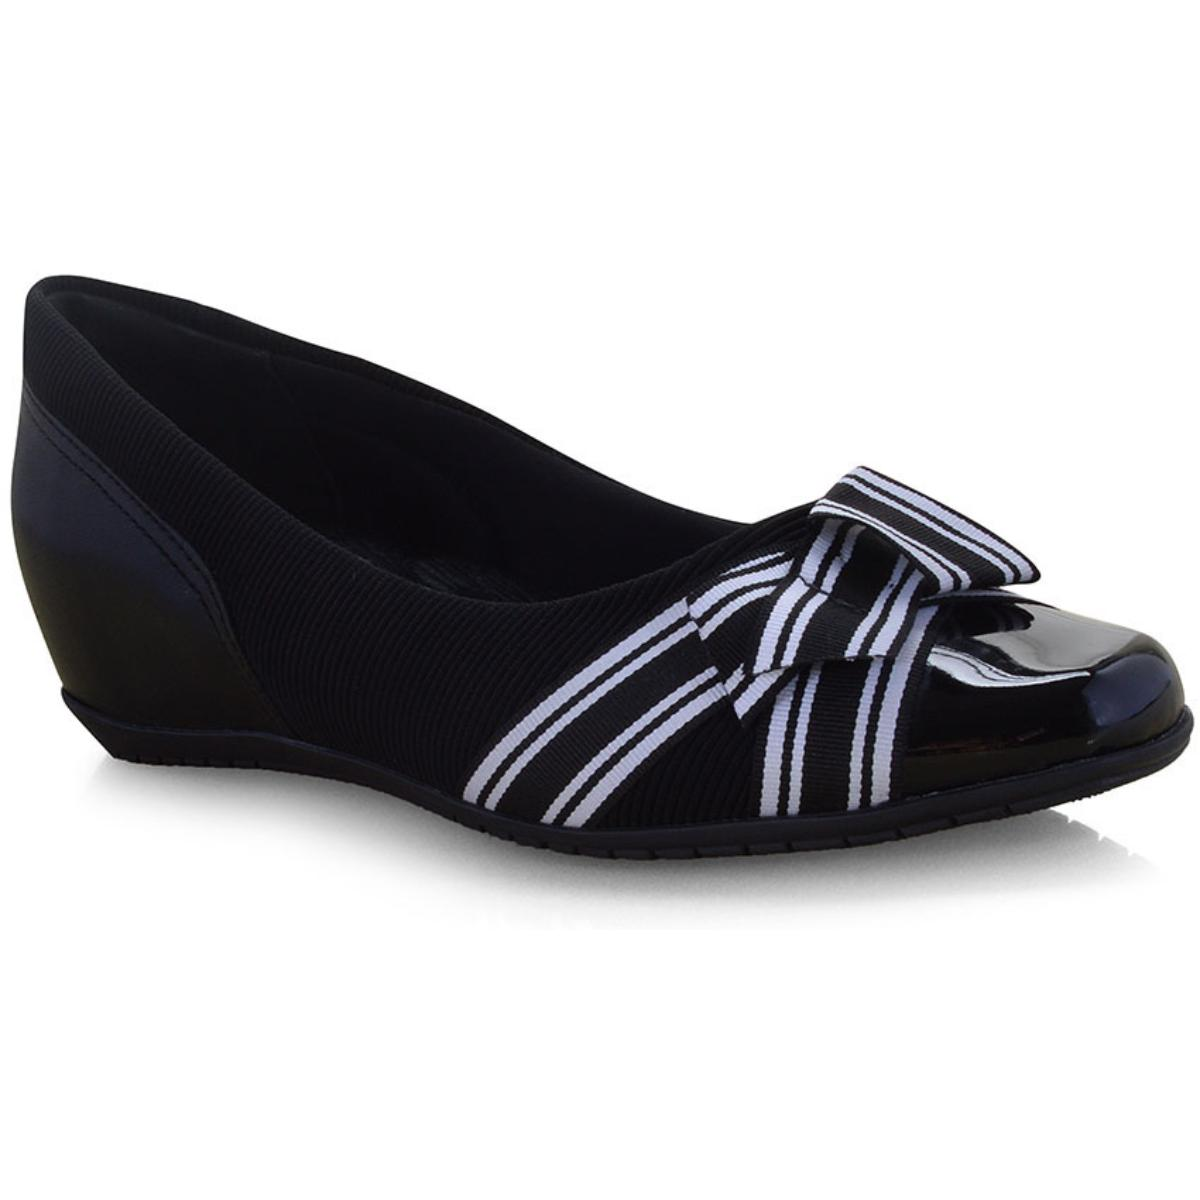 Sapato Feminino Comfortflex 19-94303 Preto/branco